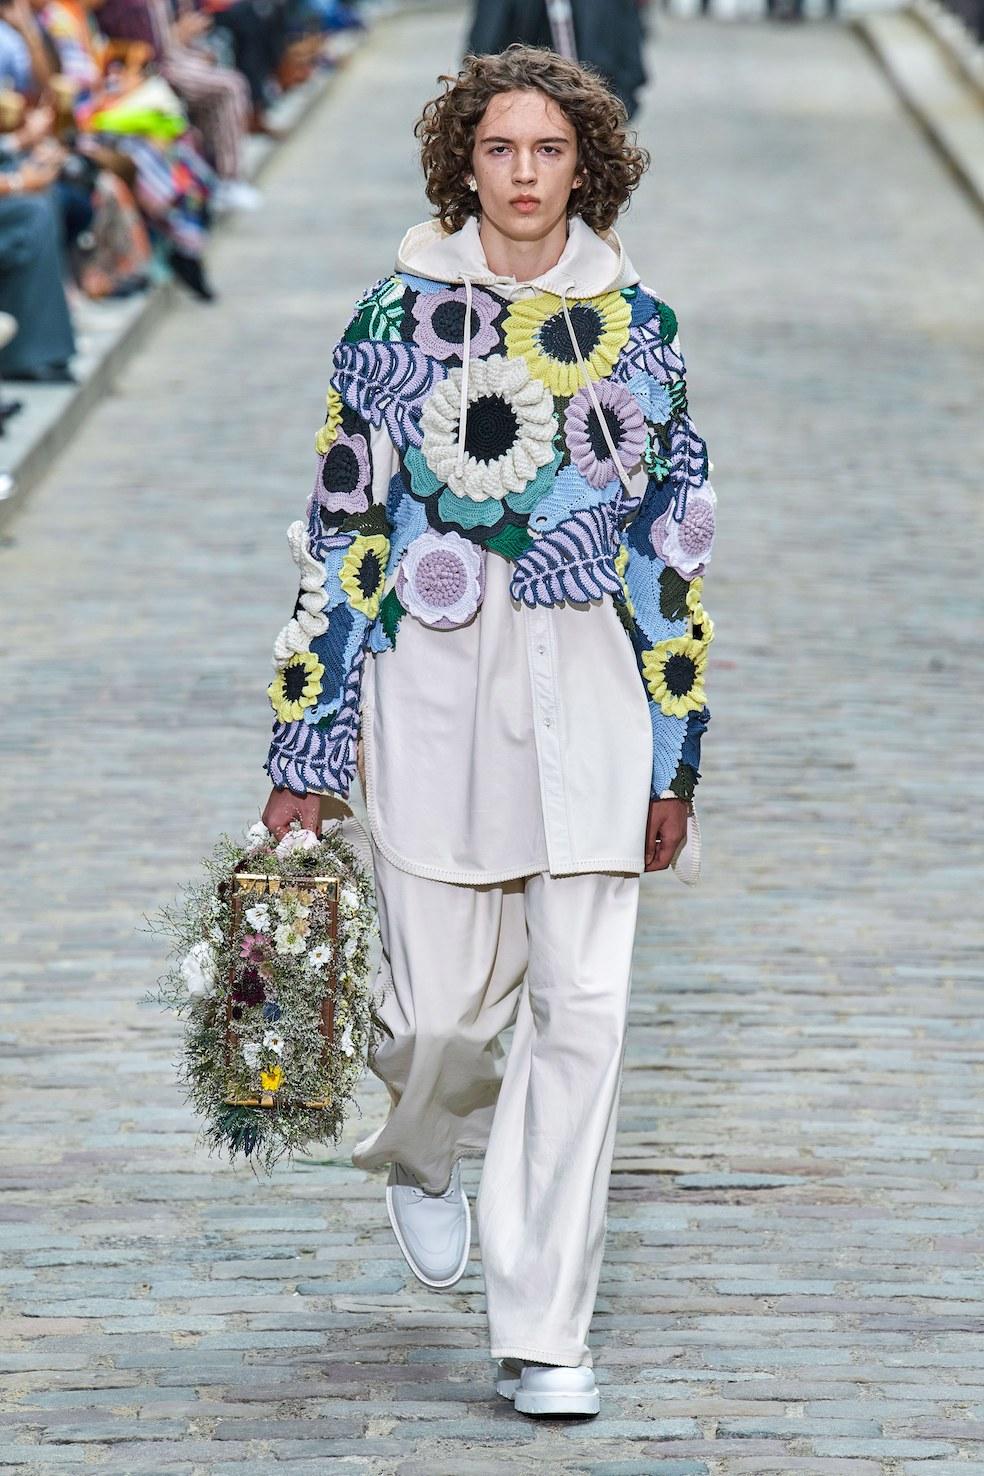 Louis_Vuitton_SS20_Behind_The_Blinds_Magazine__FIO0657.jpg